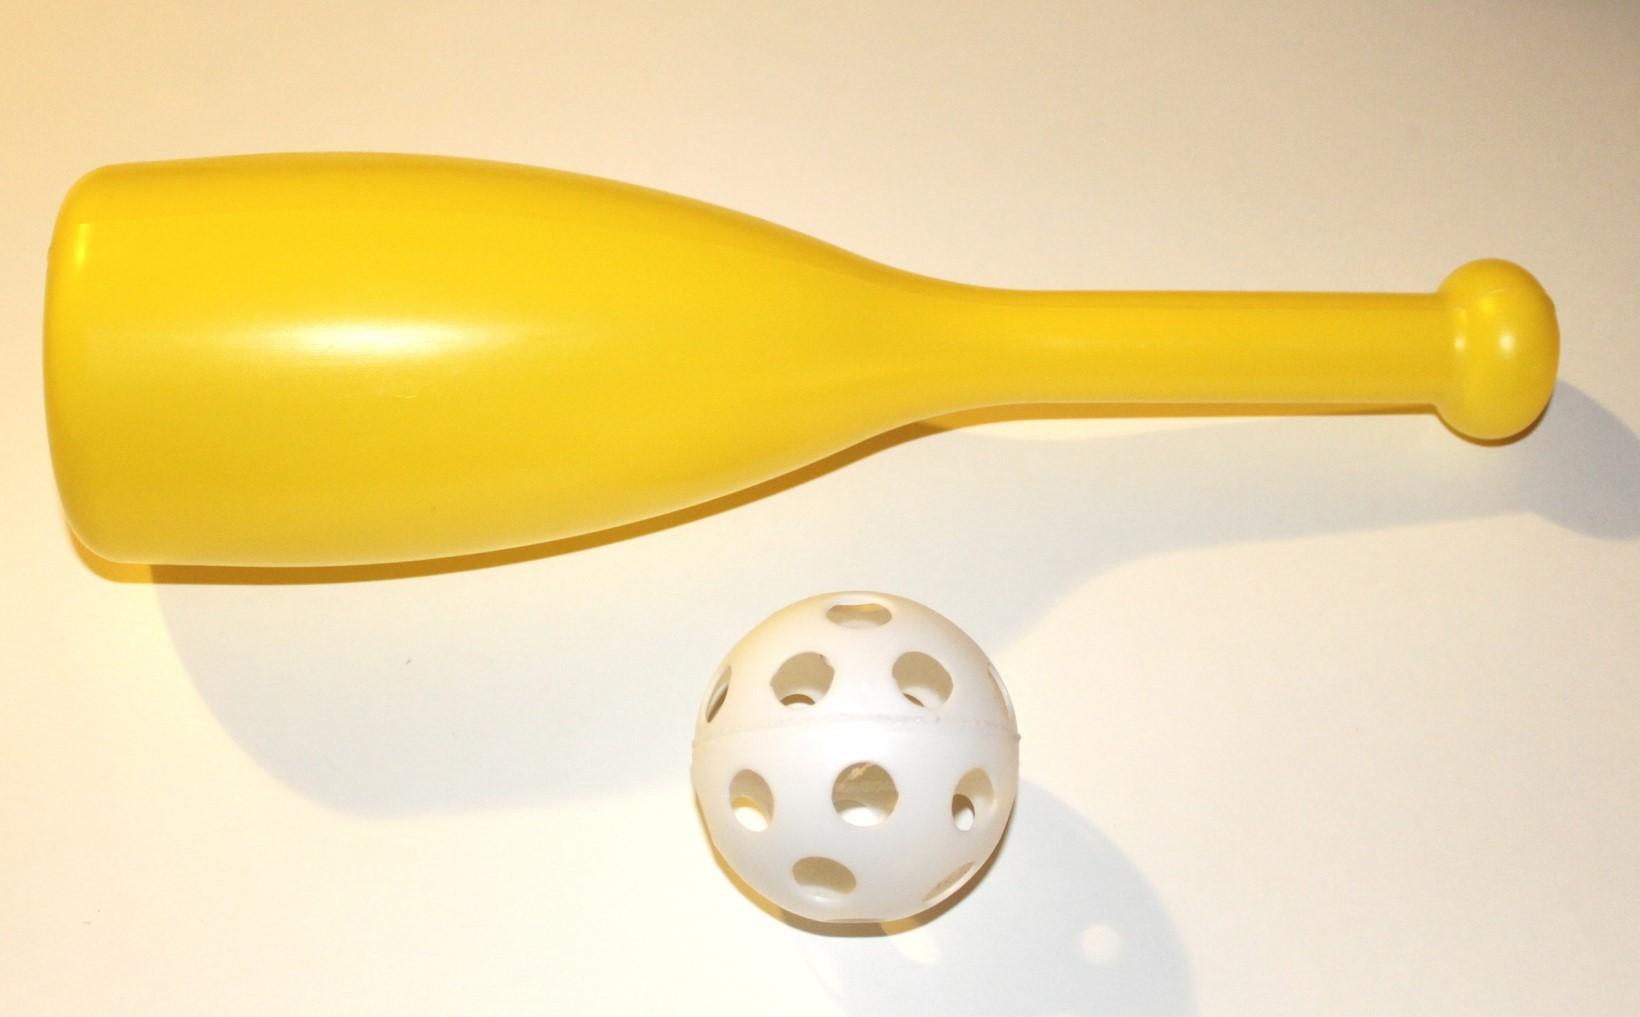 Wiffle ball bat and ball.